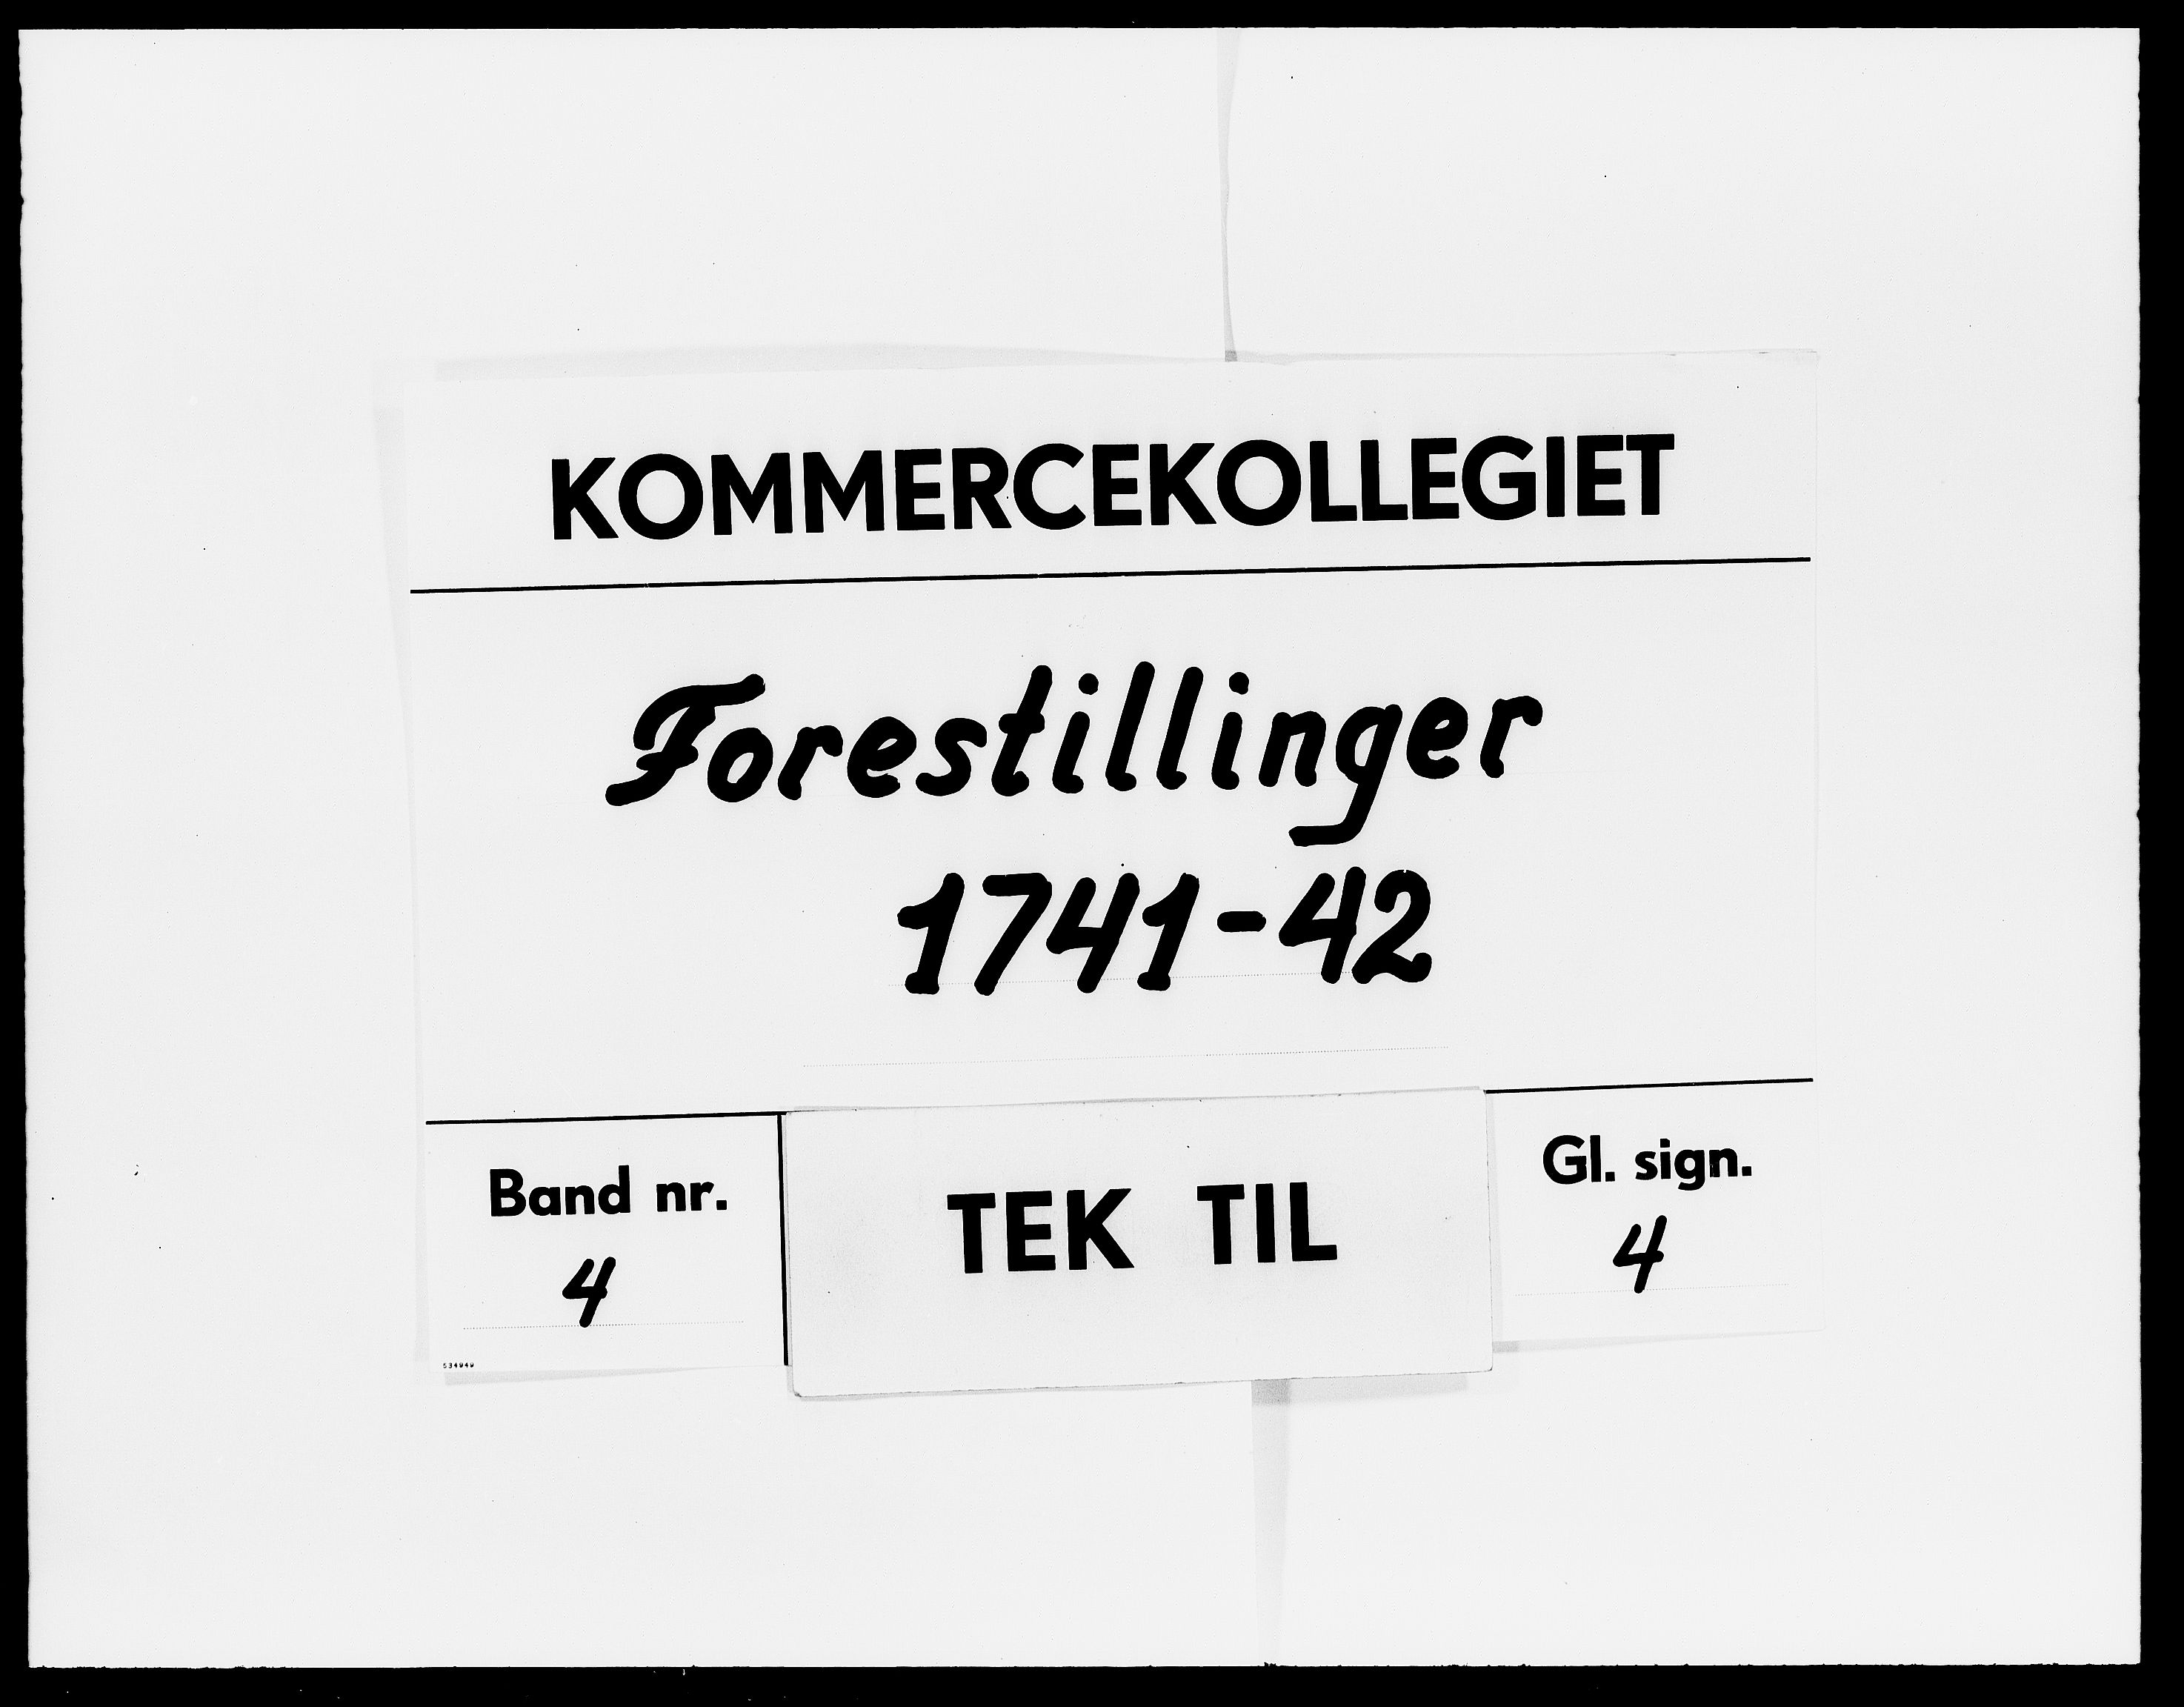 DRA, Kommercekollegiet, Dansk-Norske Sekretariat (1736-1771) / Kommercedeputationen (1771-1773), -/004: Forestillinger, 1741-1742